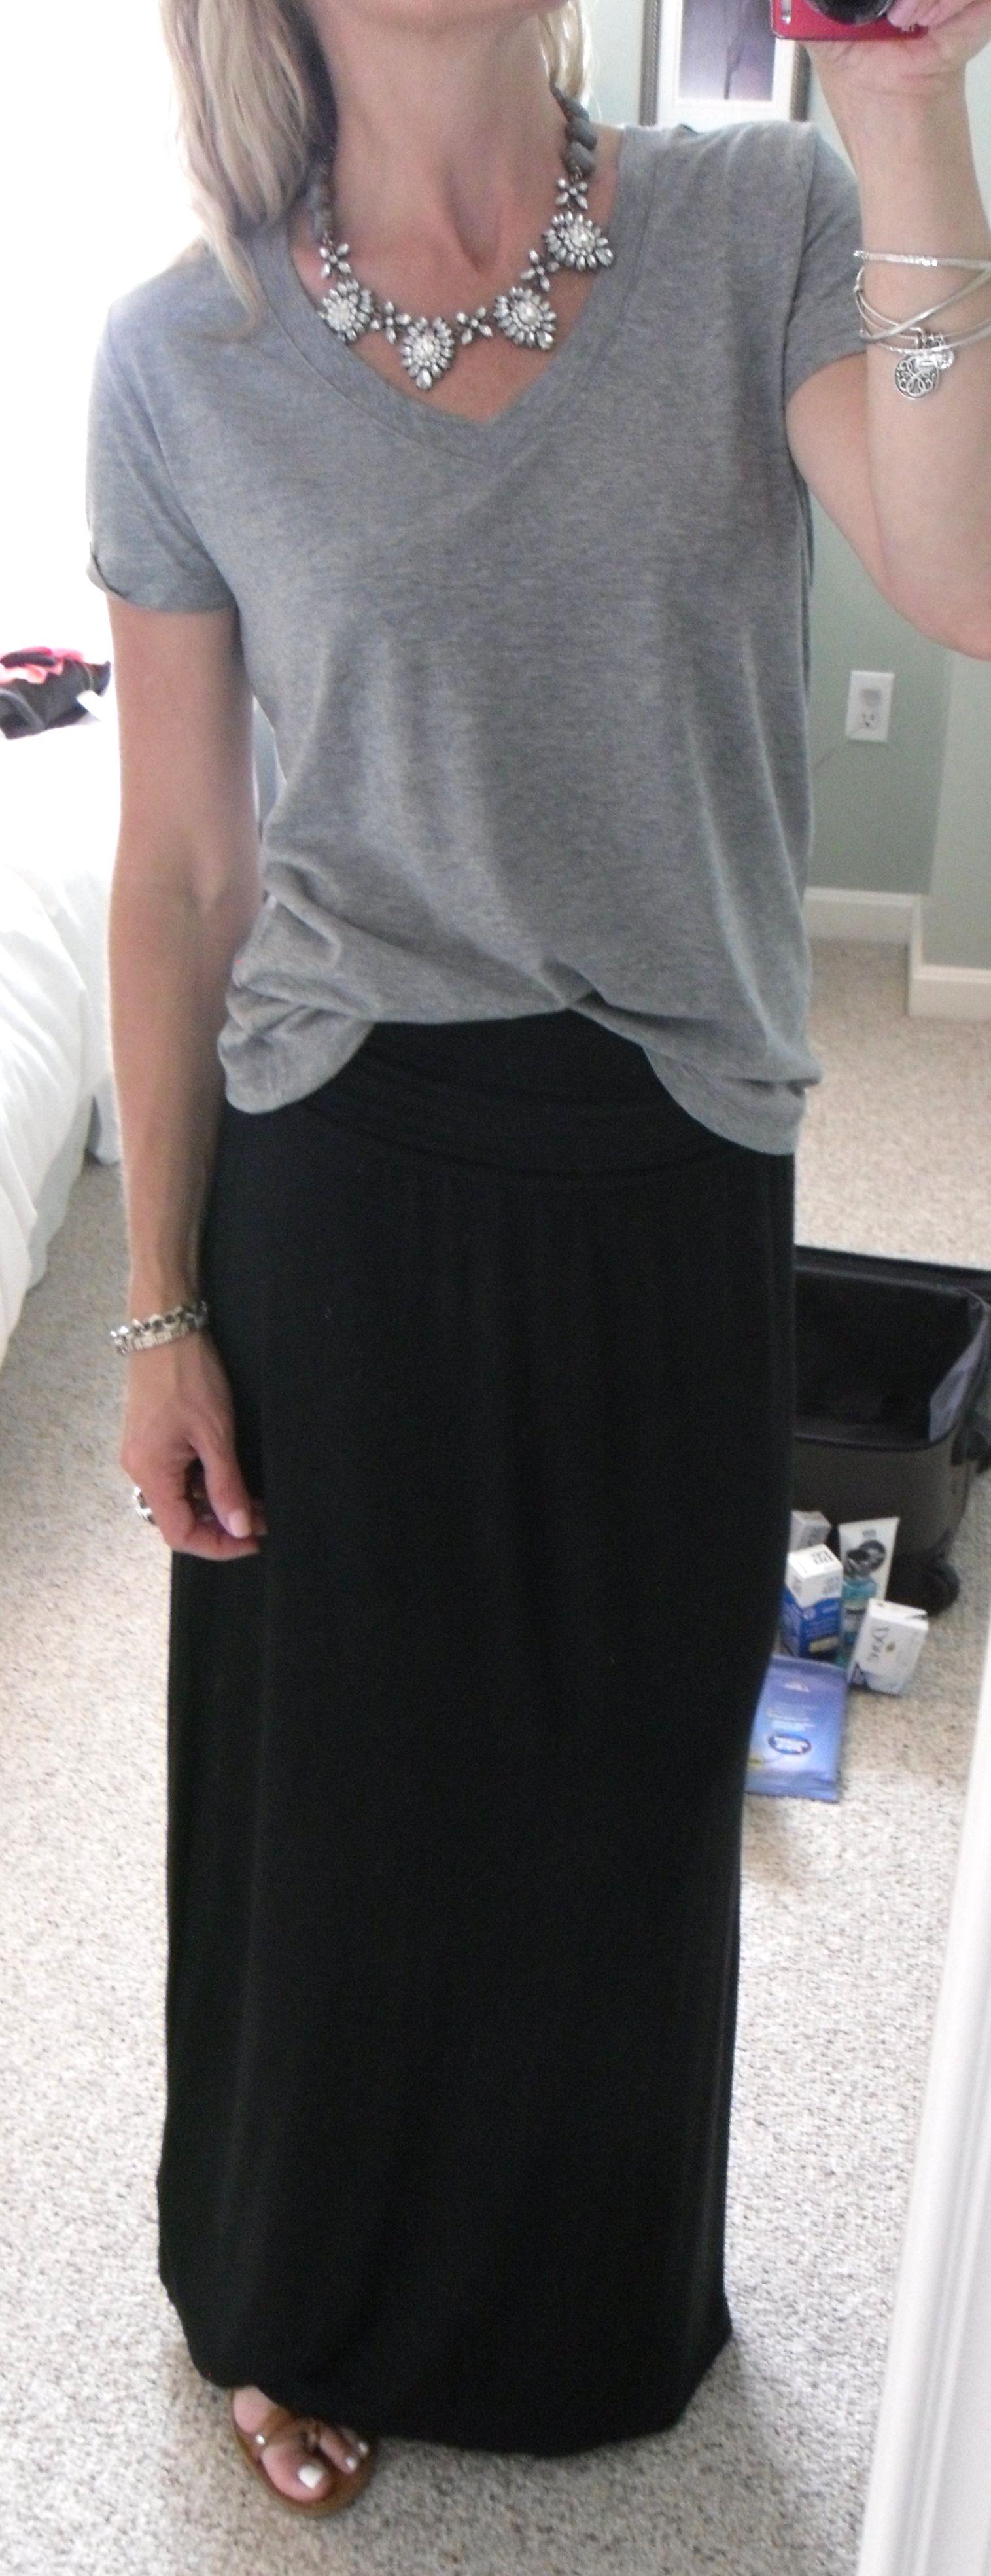 Black t shirt old navy - Old Navy Black Convertible Maxi Skirt Converts To Maxi Dress F21 Gray Heather